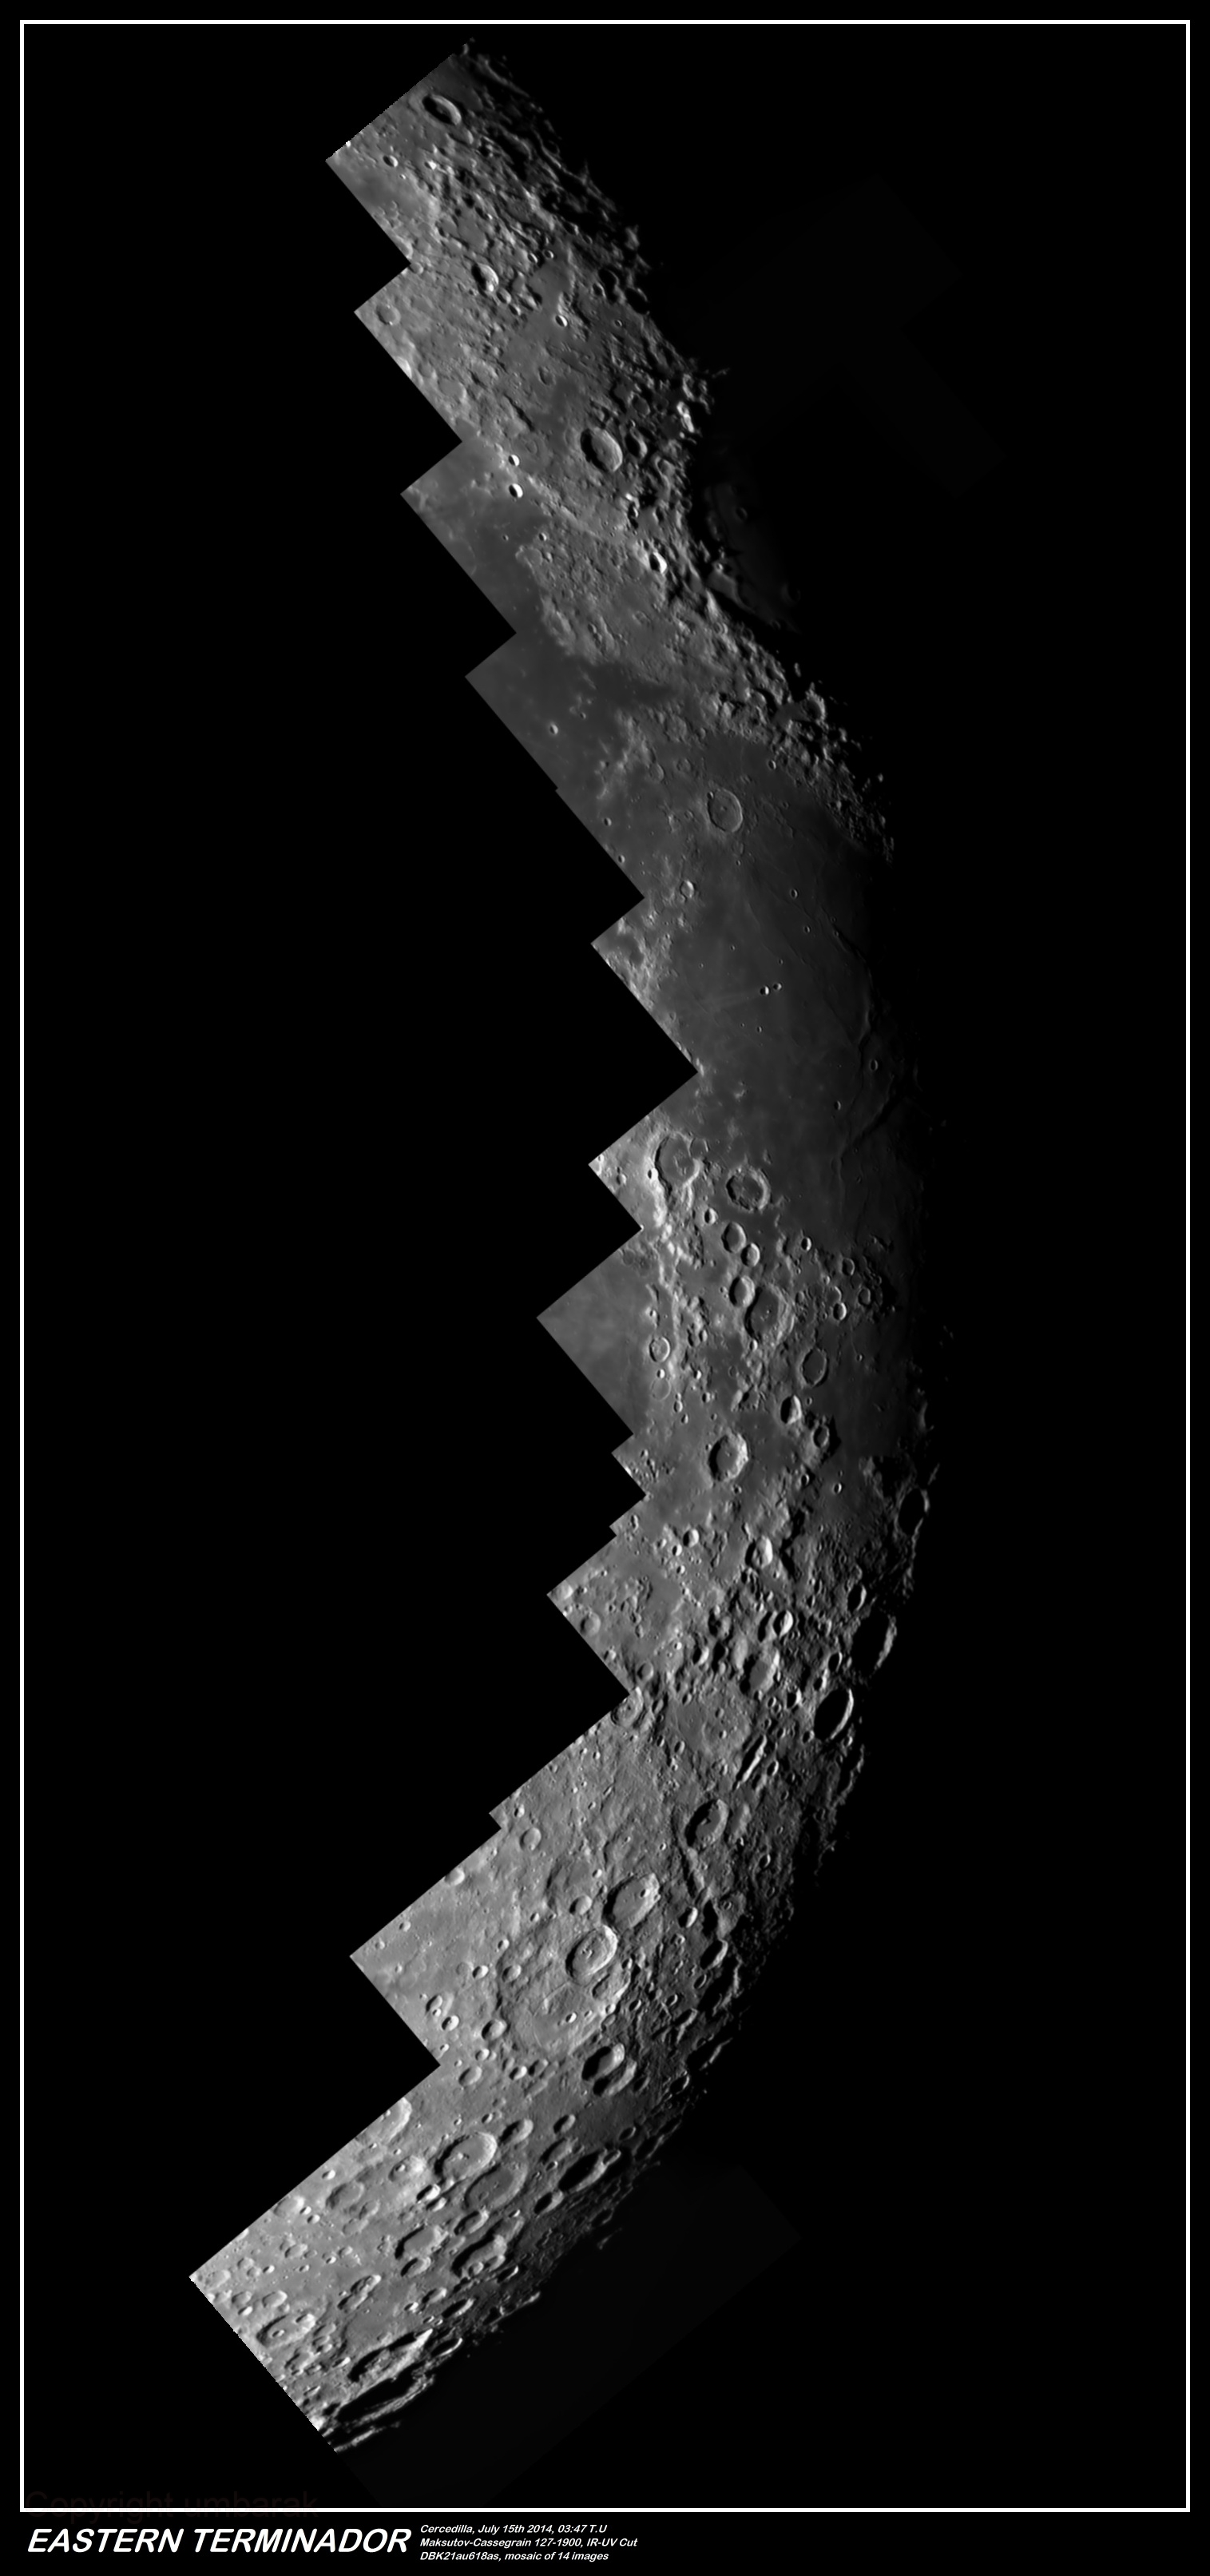 Moon Eastern Terminador 2014,                                umbarak